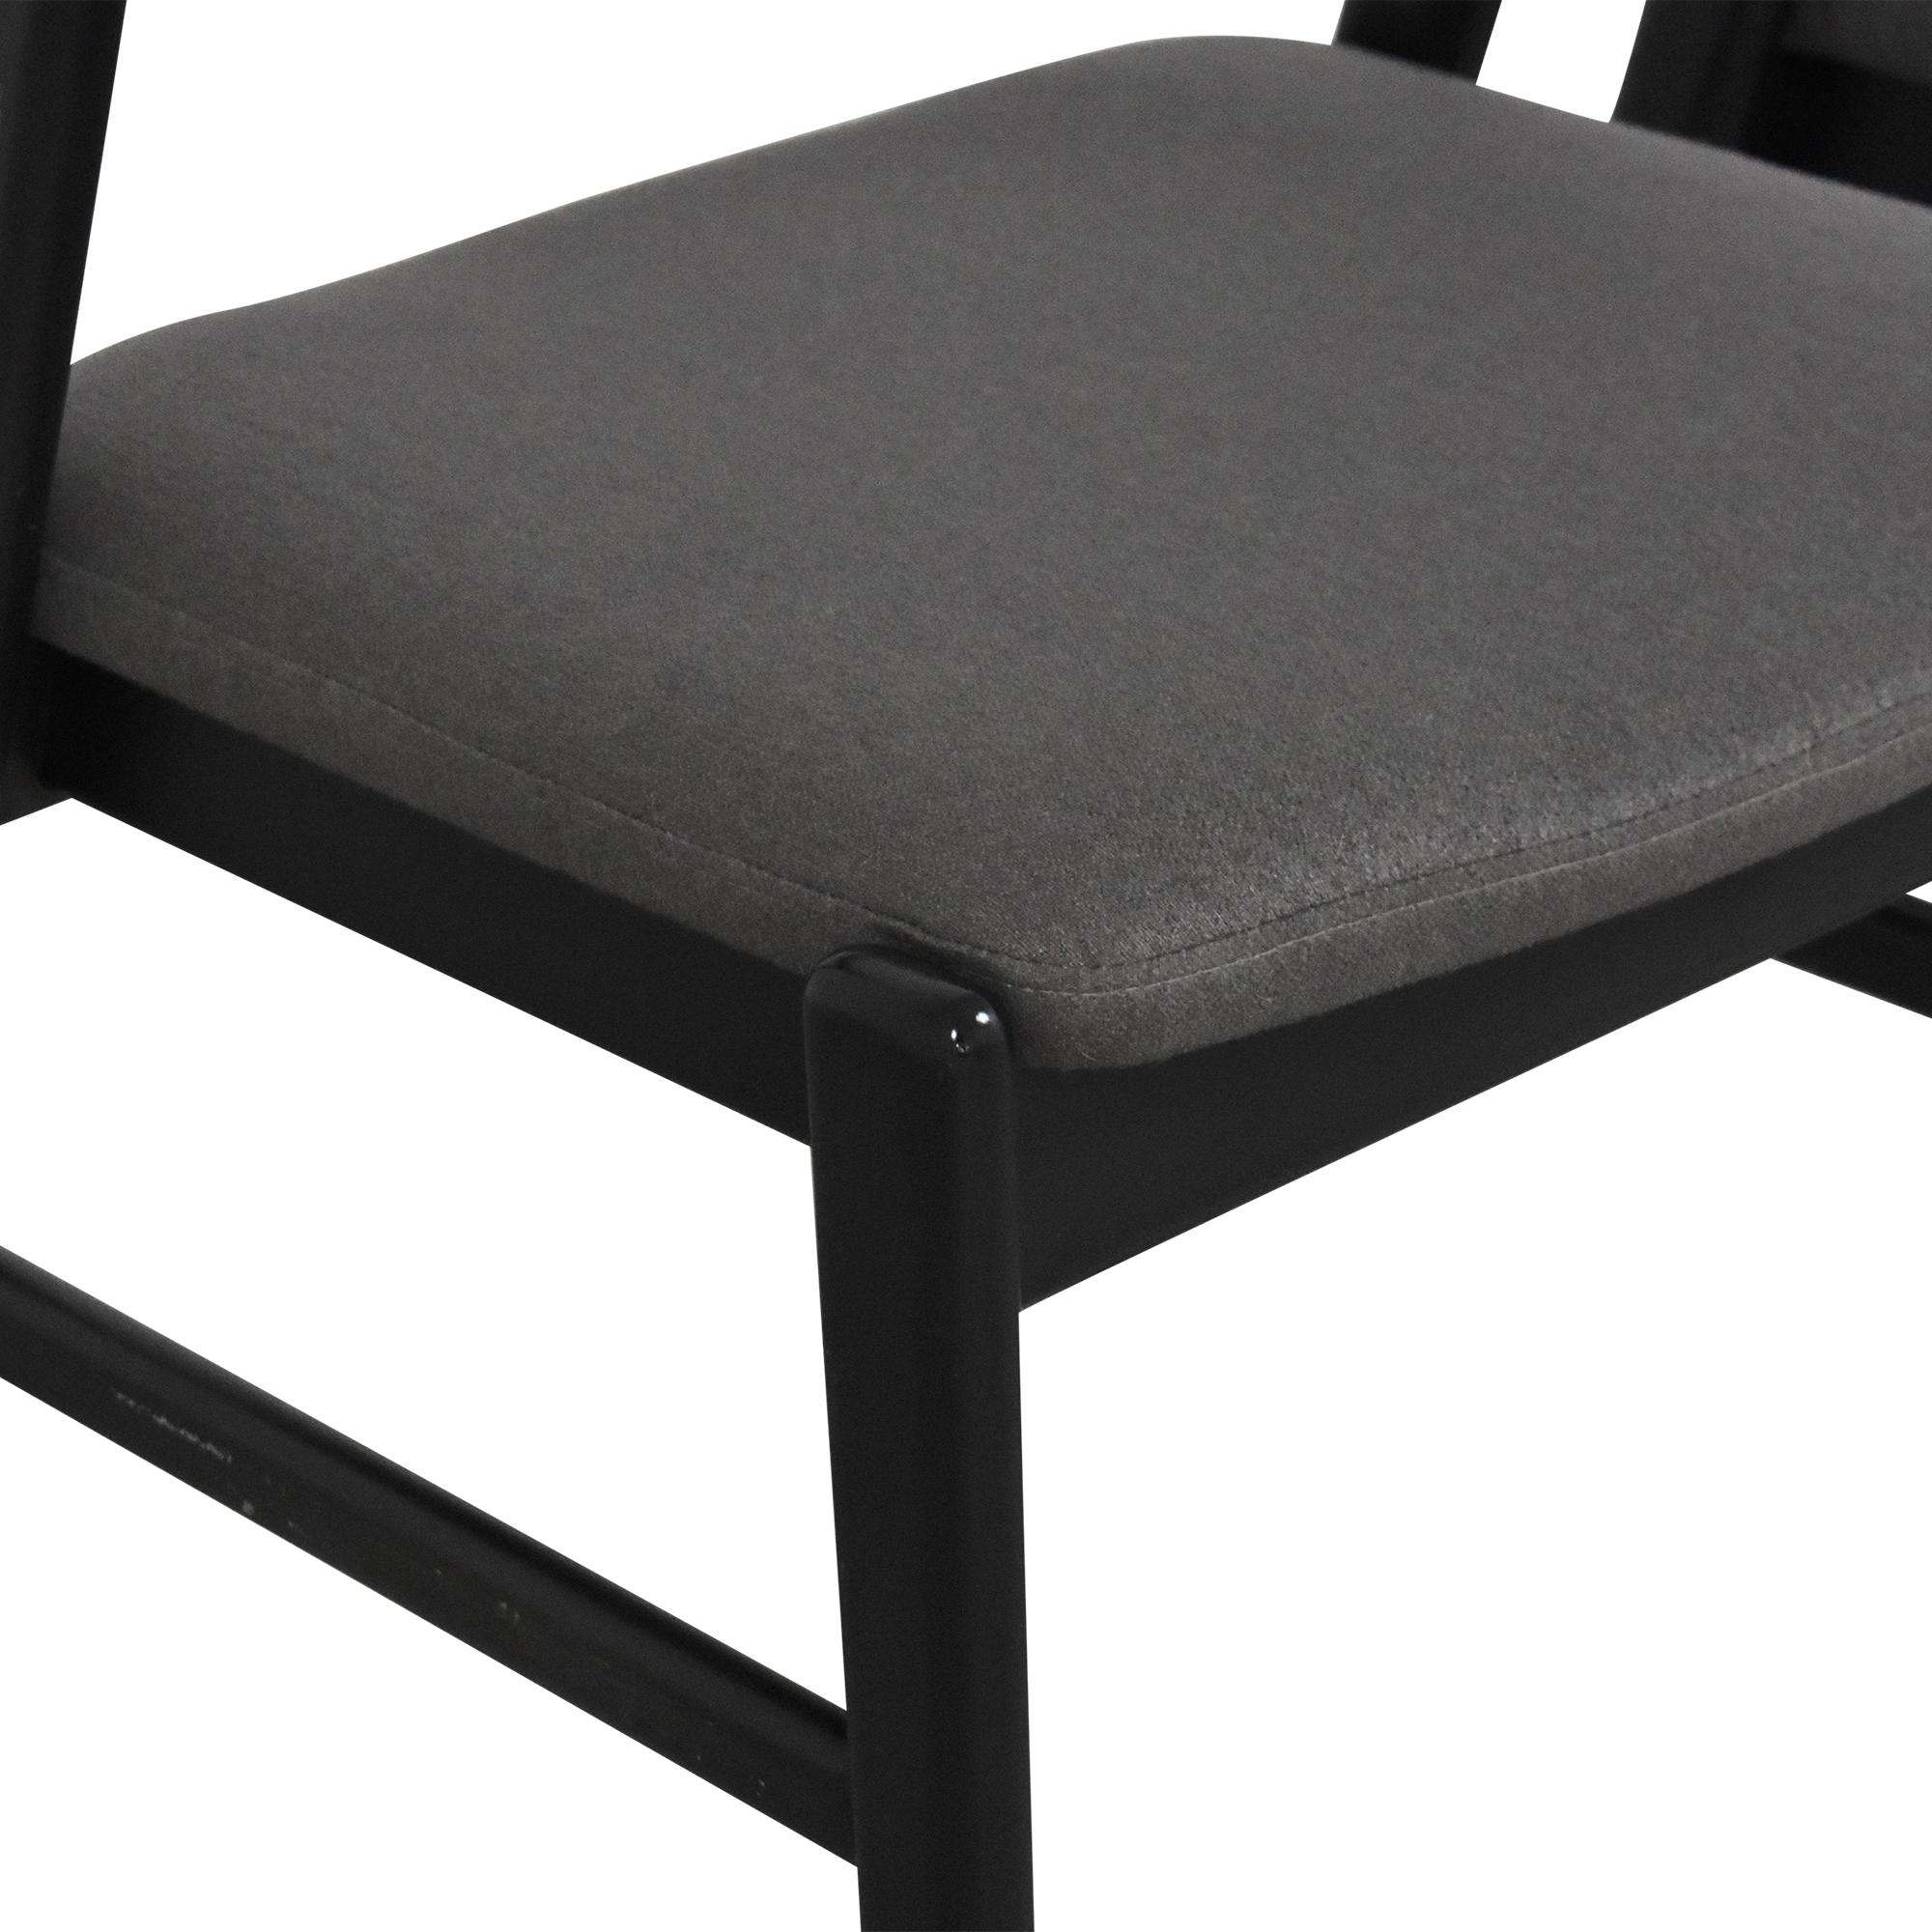 buy Room & Board Room & Board Jansen Dining Chairs online